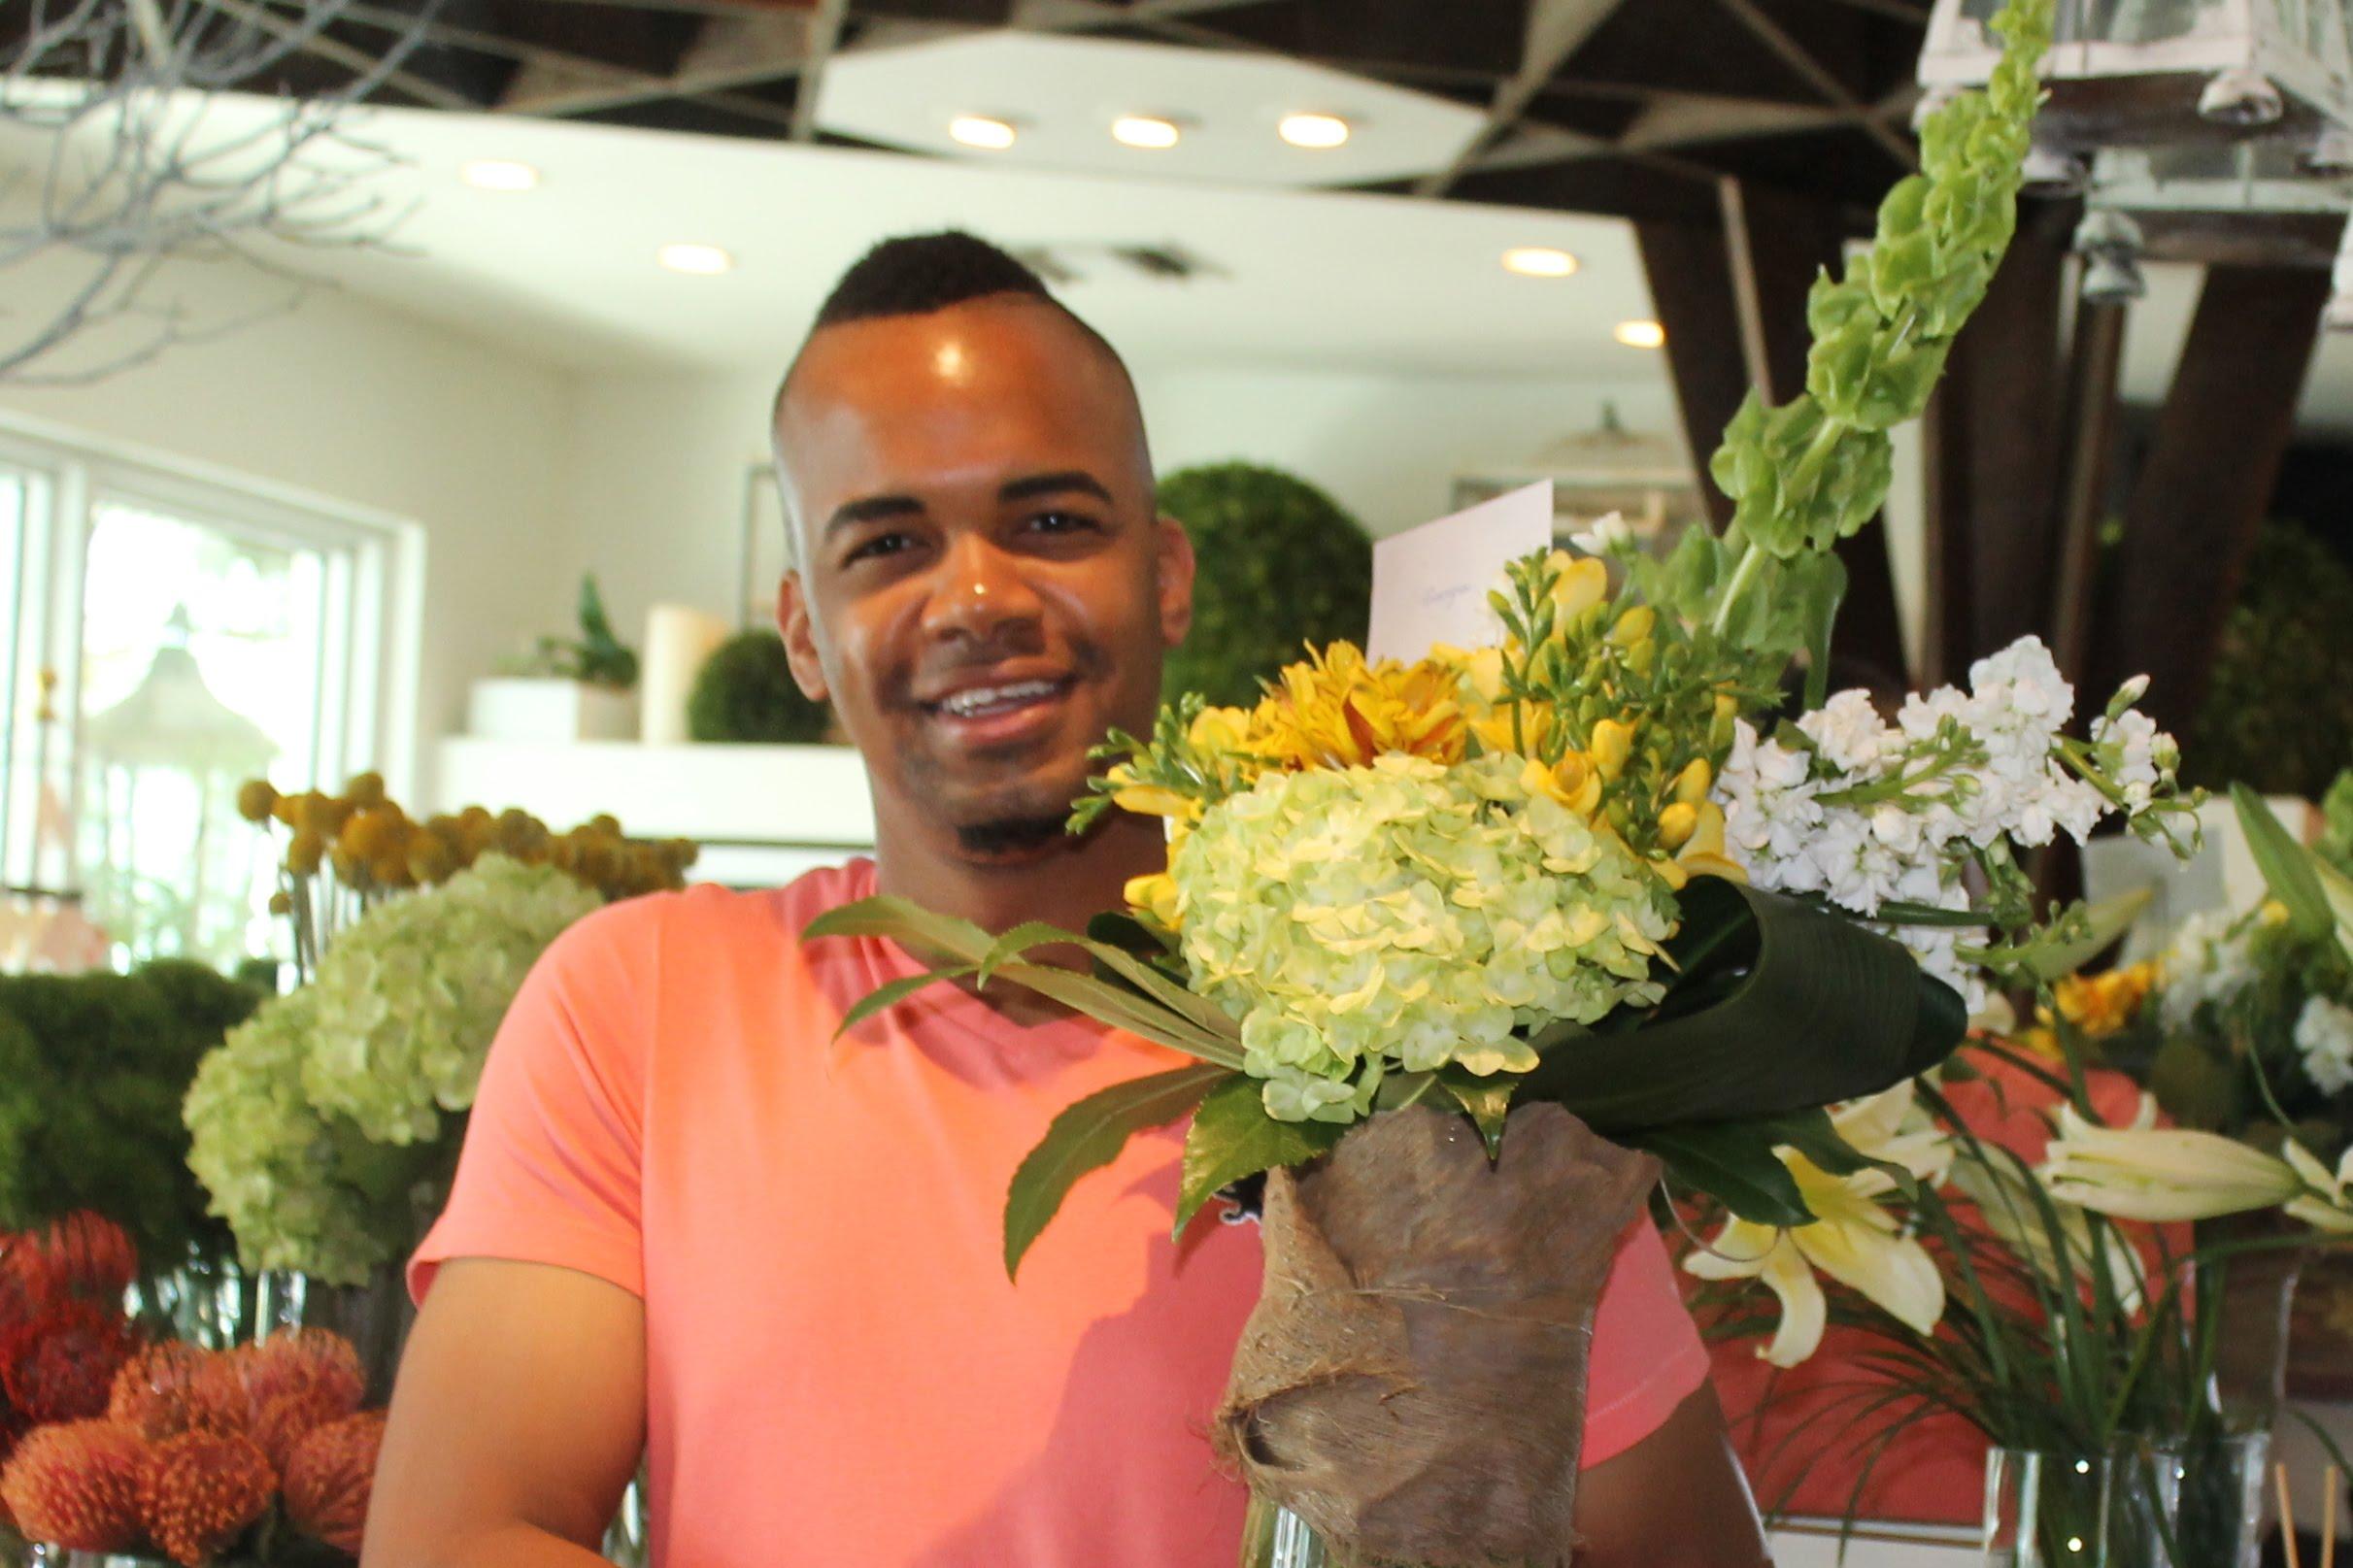 Lofton Delivering flowers